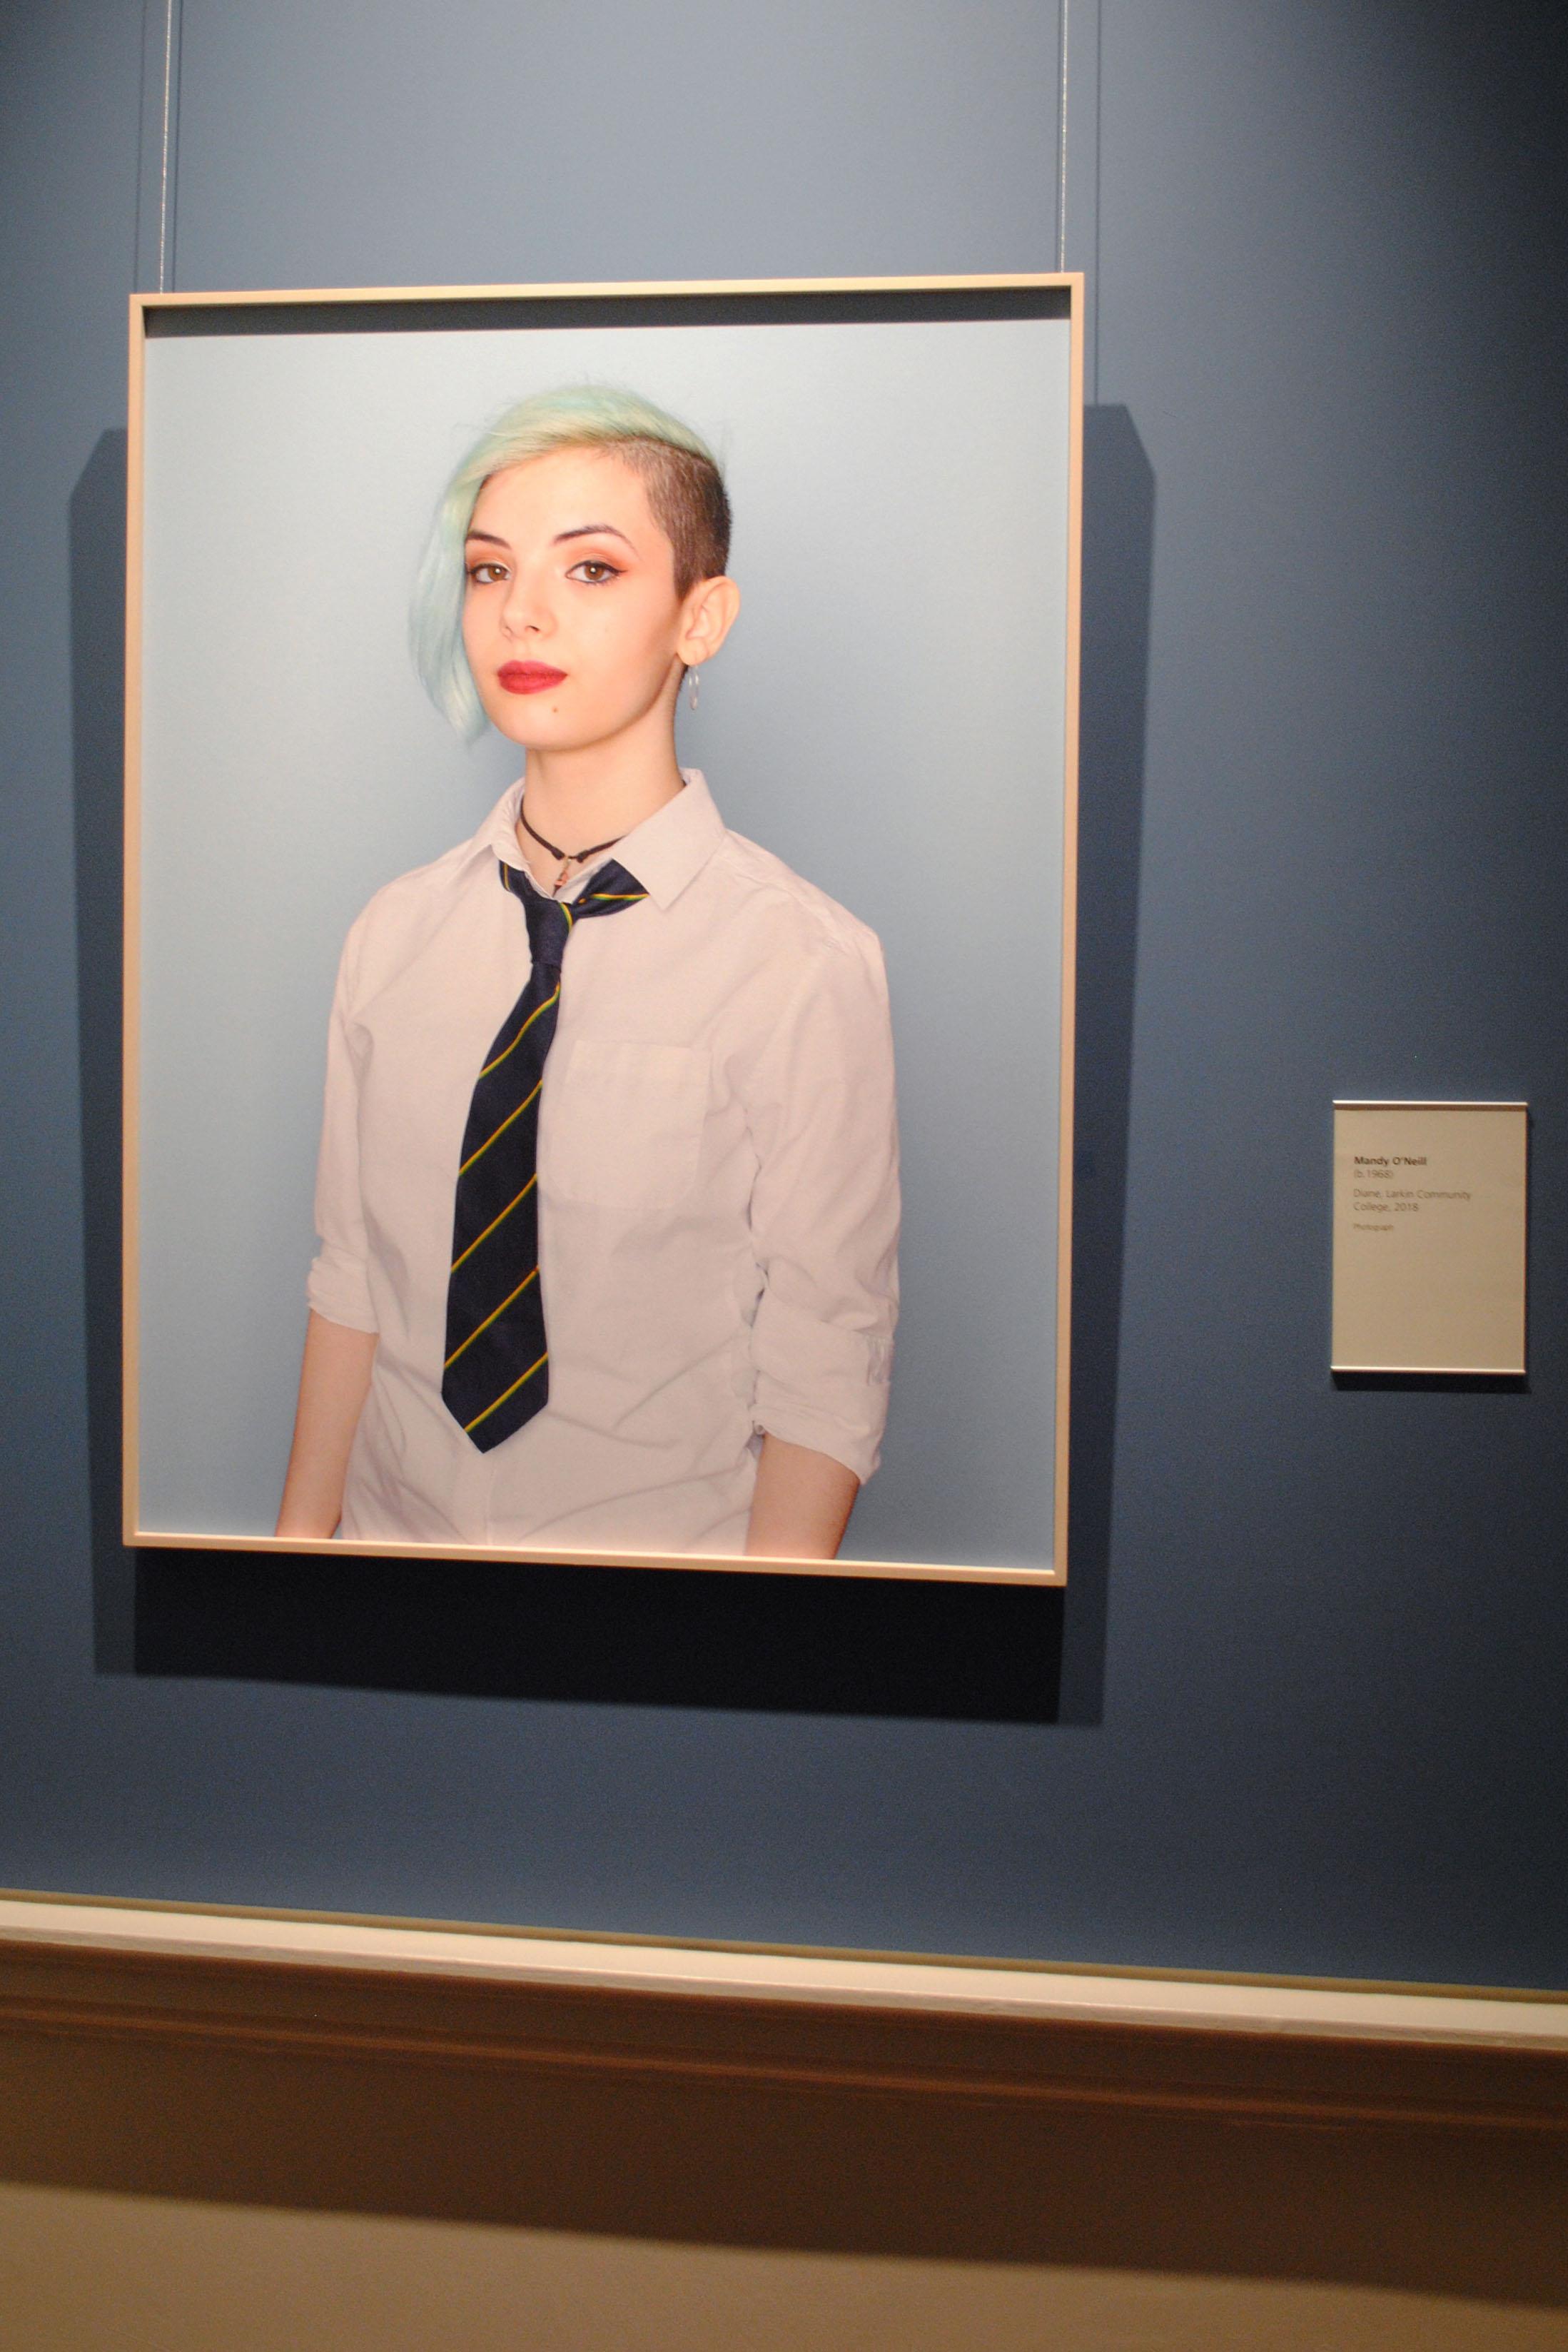 Mandy O'Neill's photo of Diane, Larkin Community College 2018, recently won Portrait of the Year.